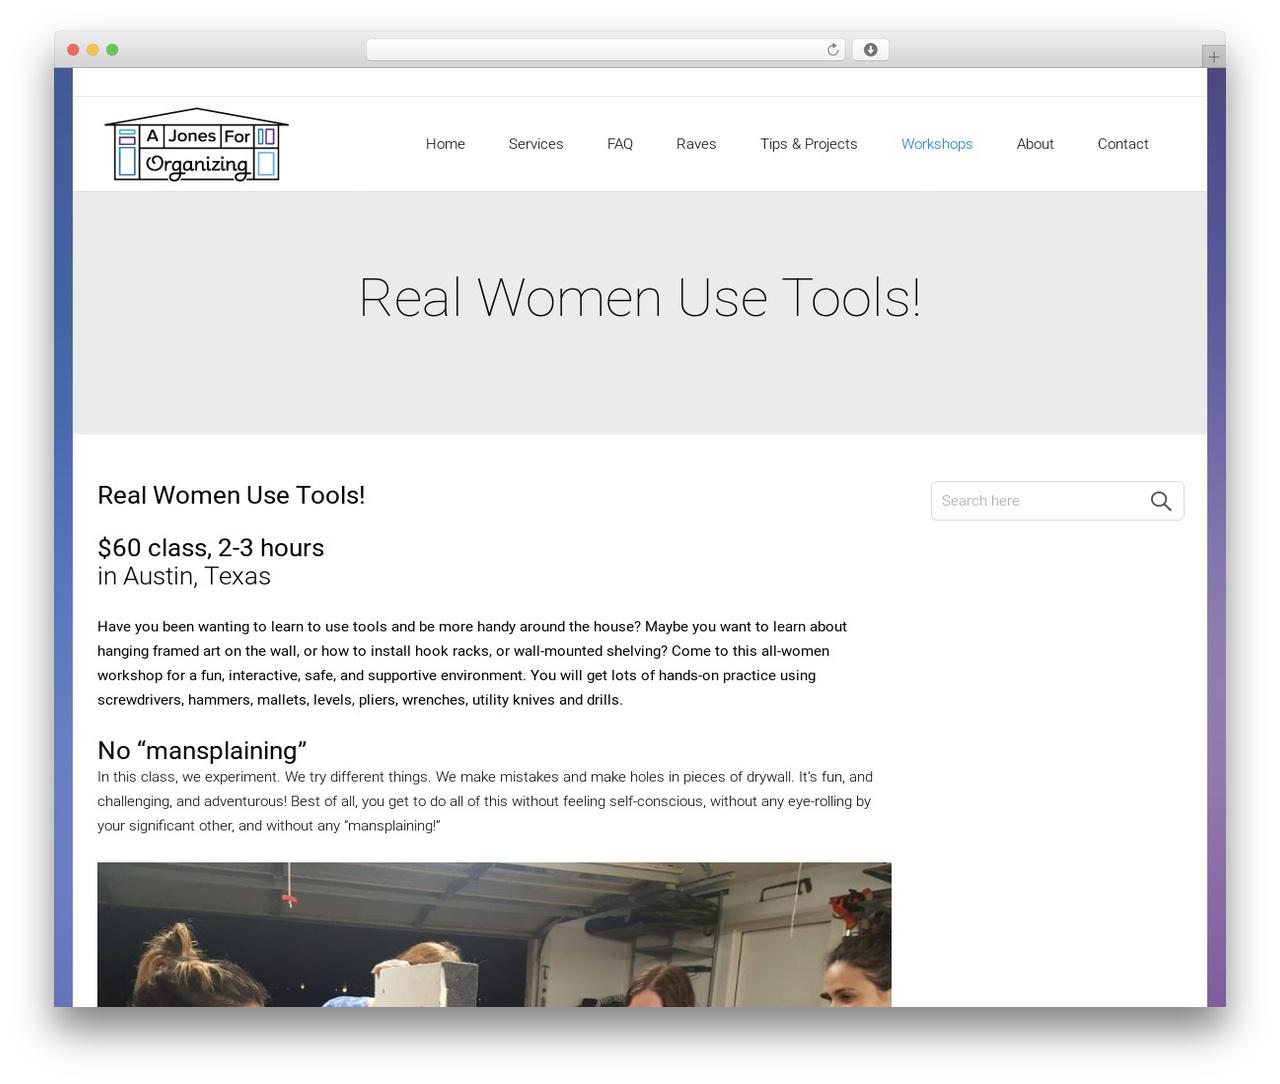 Satellite7 best WordPress theme - ajonesfororganizing.com/real-women-use-tools